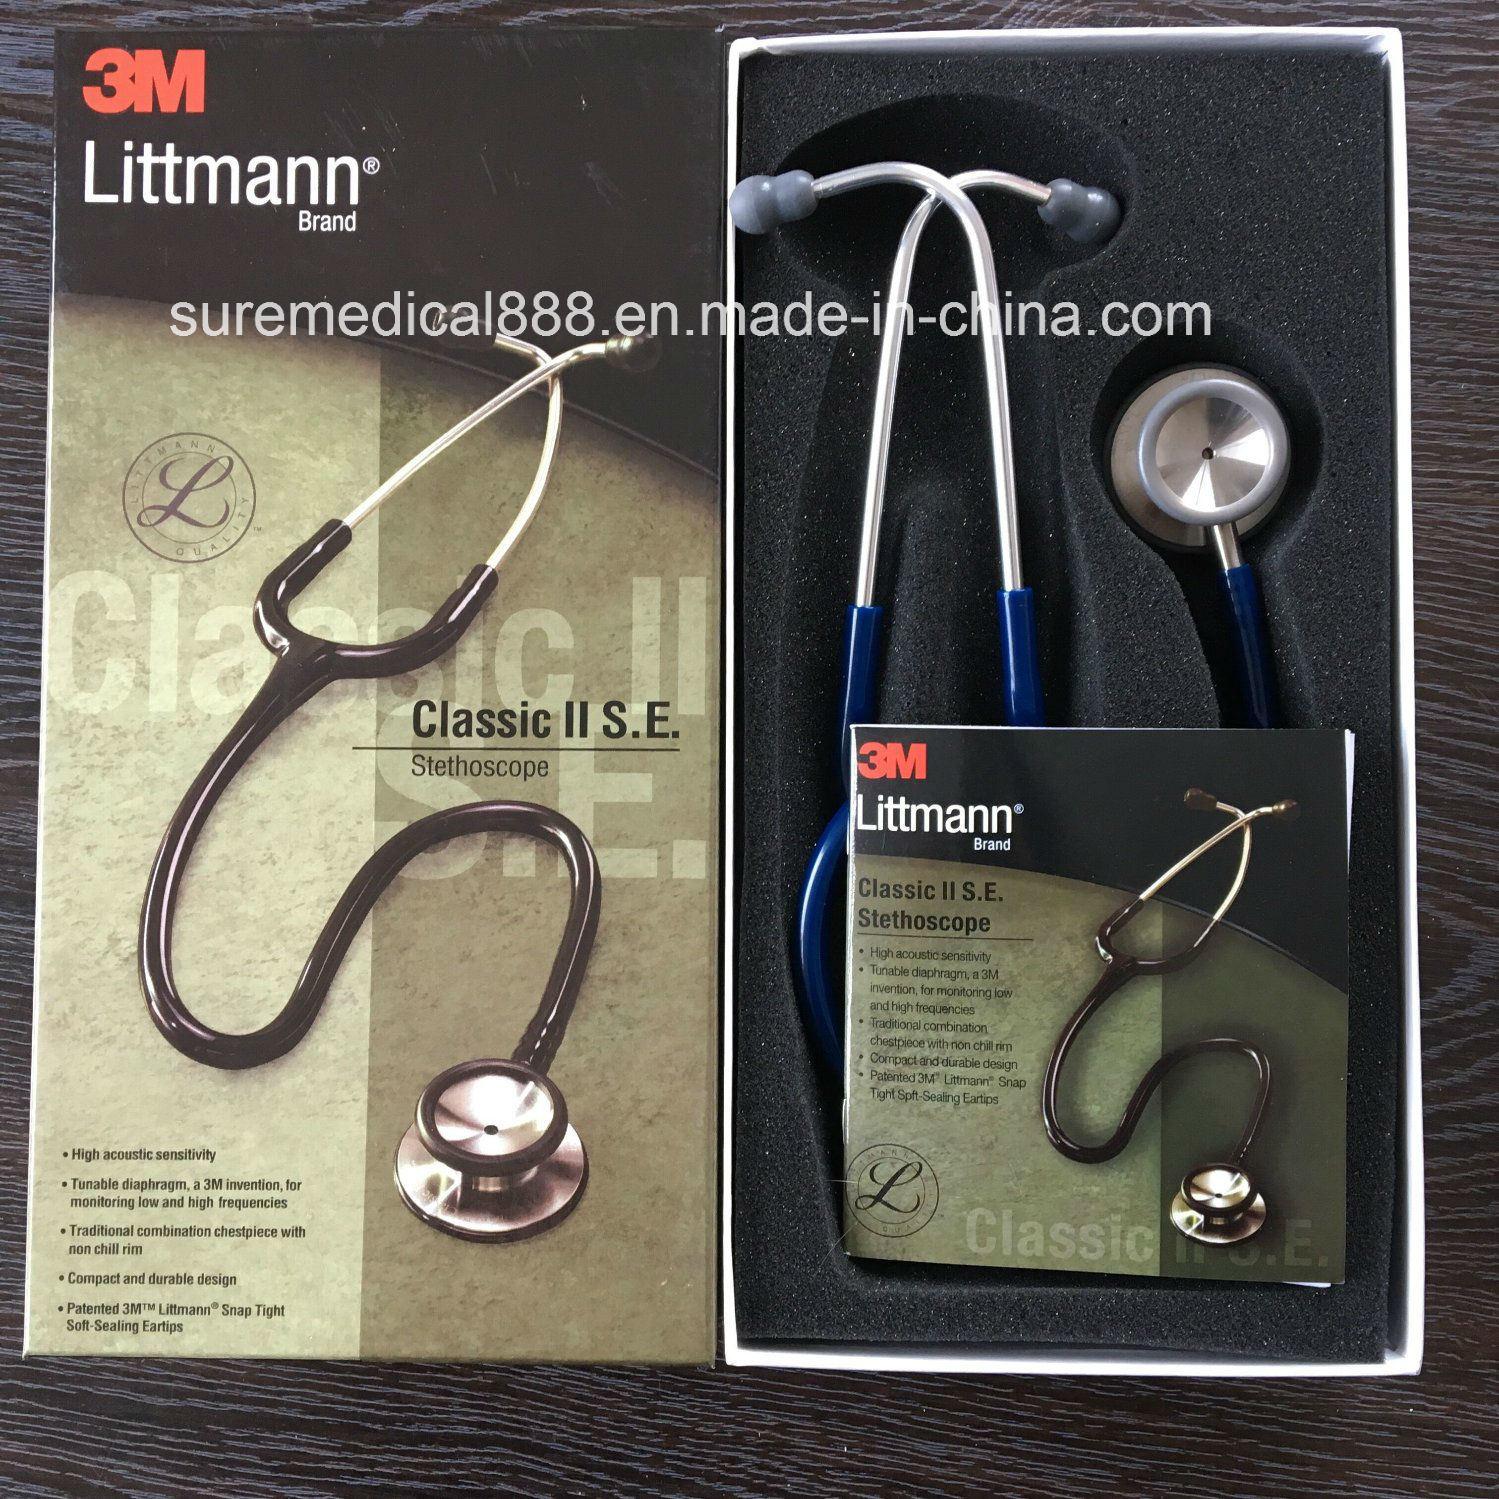 3m Littmann Classic II S. E. Stethoscope (Cardiology) (SR2201)